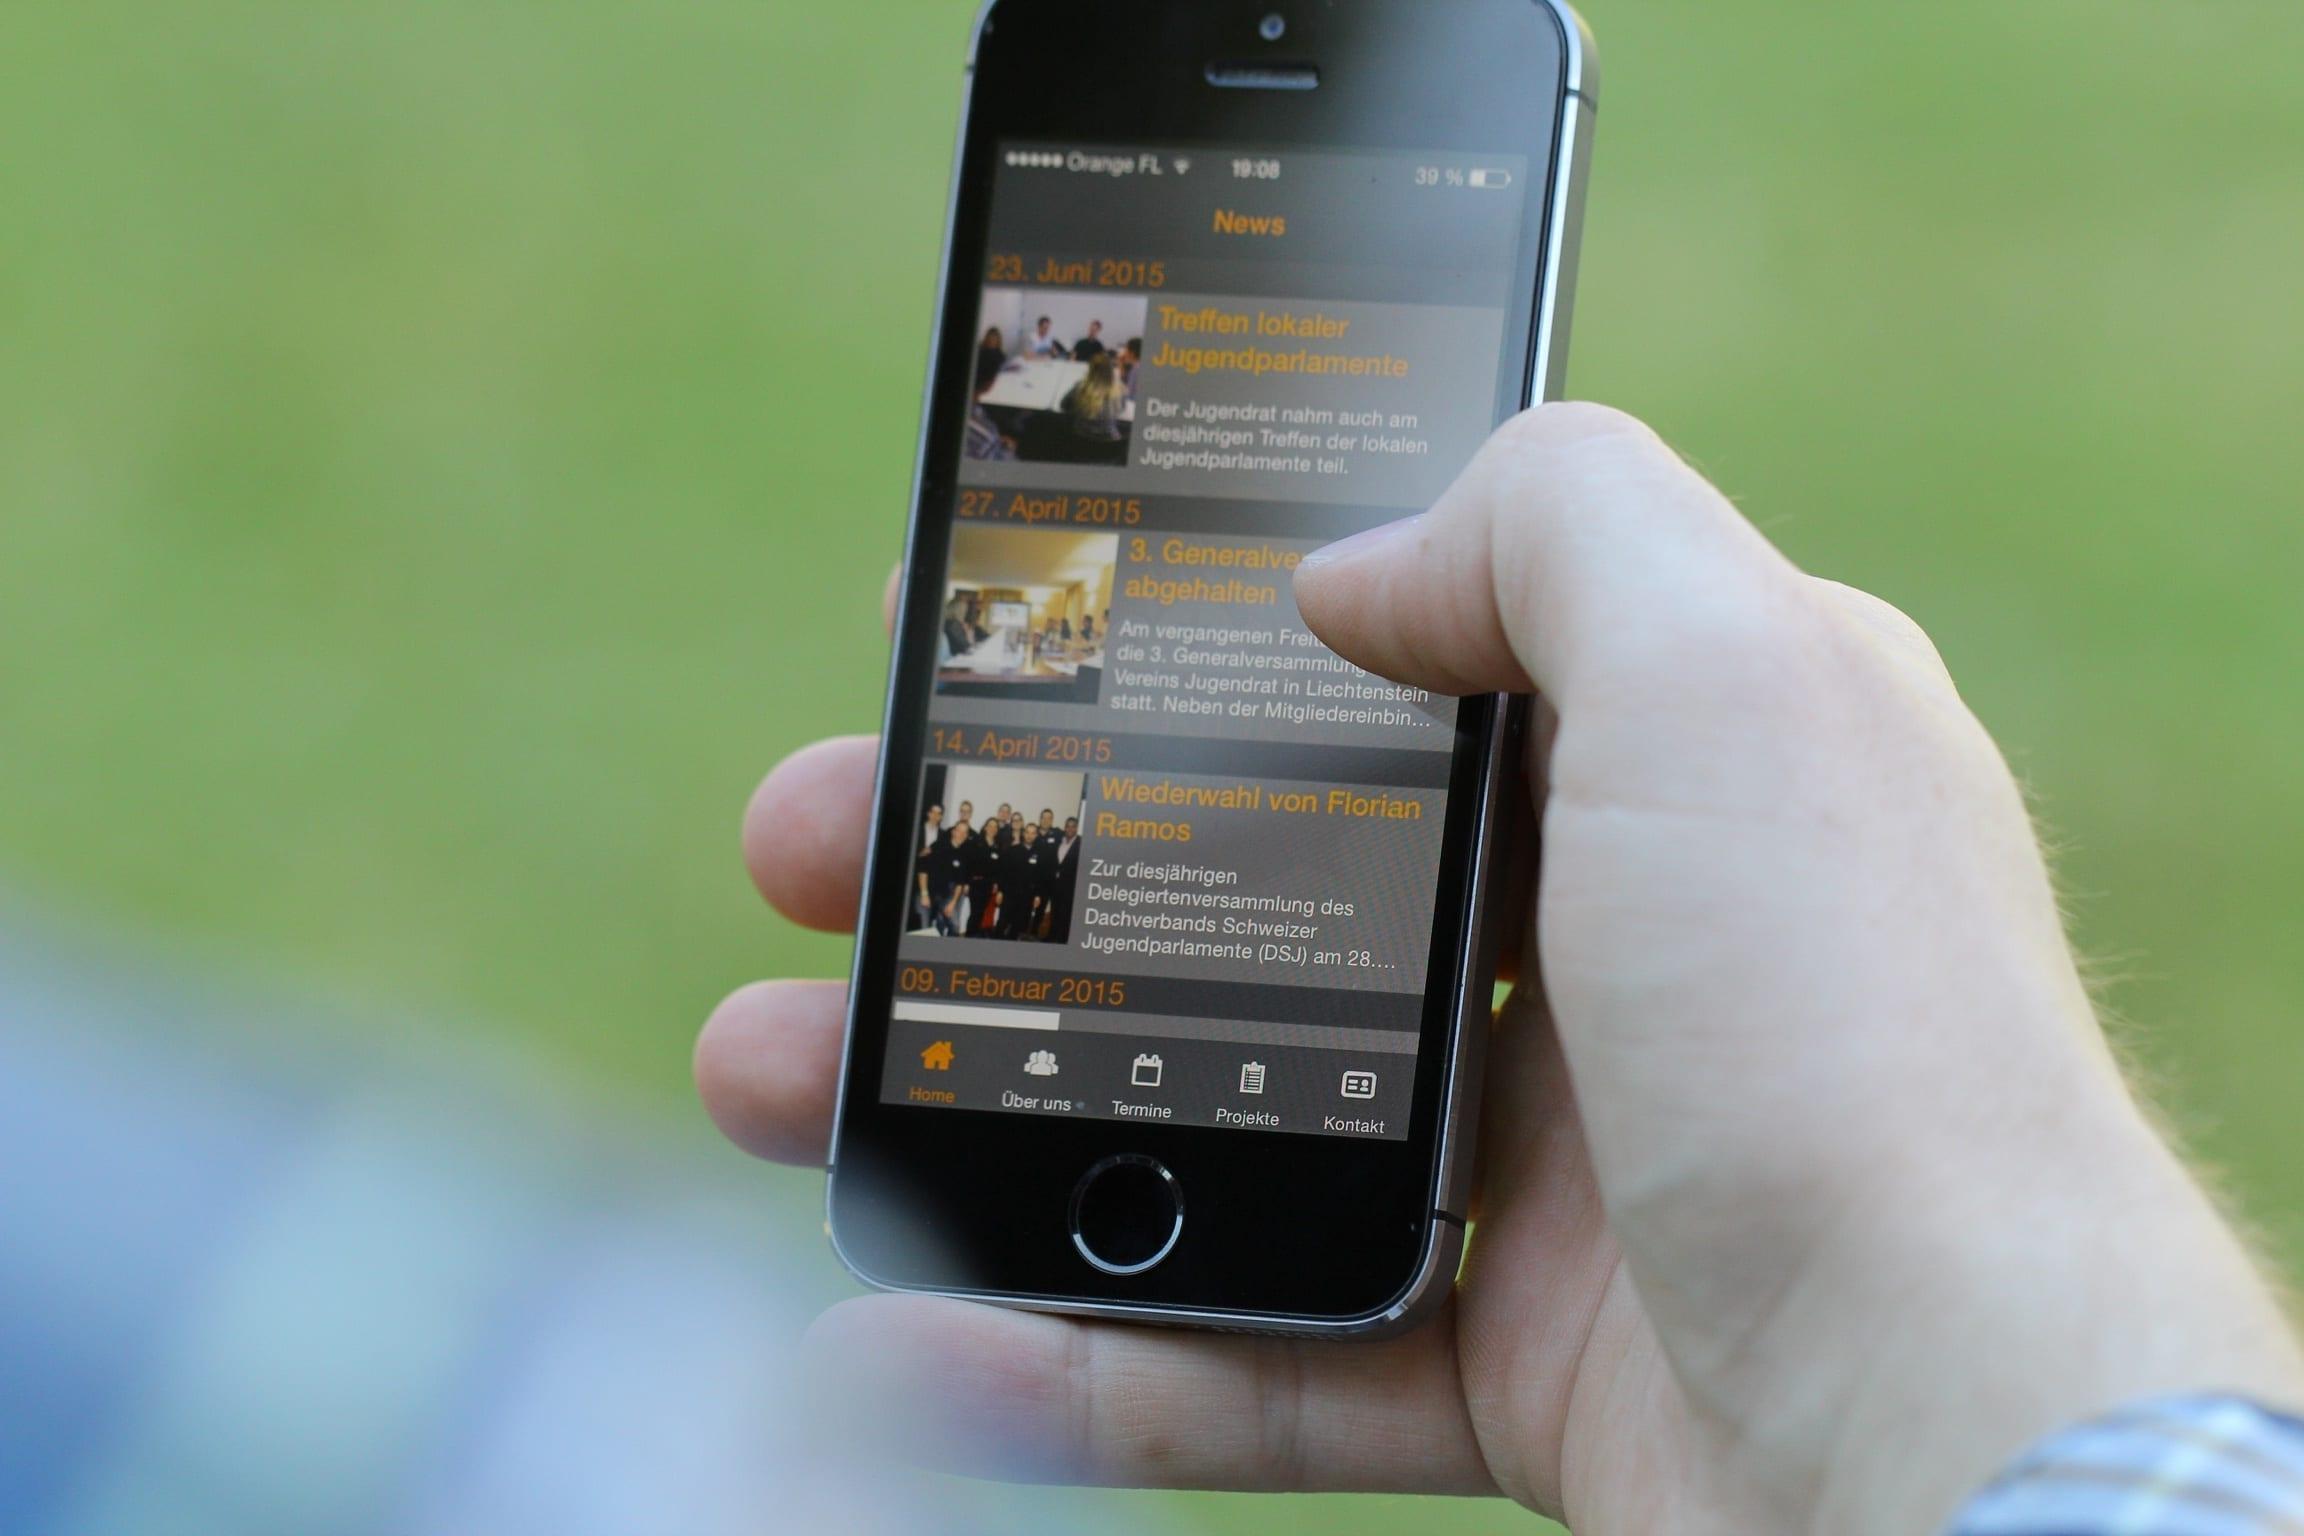 Introducing Jugendrat App 2.0